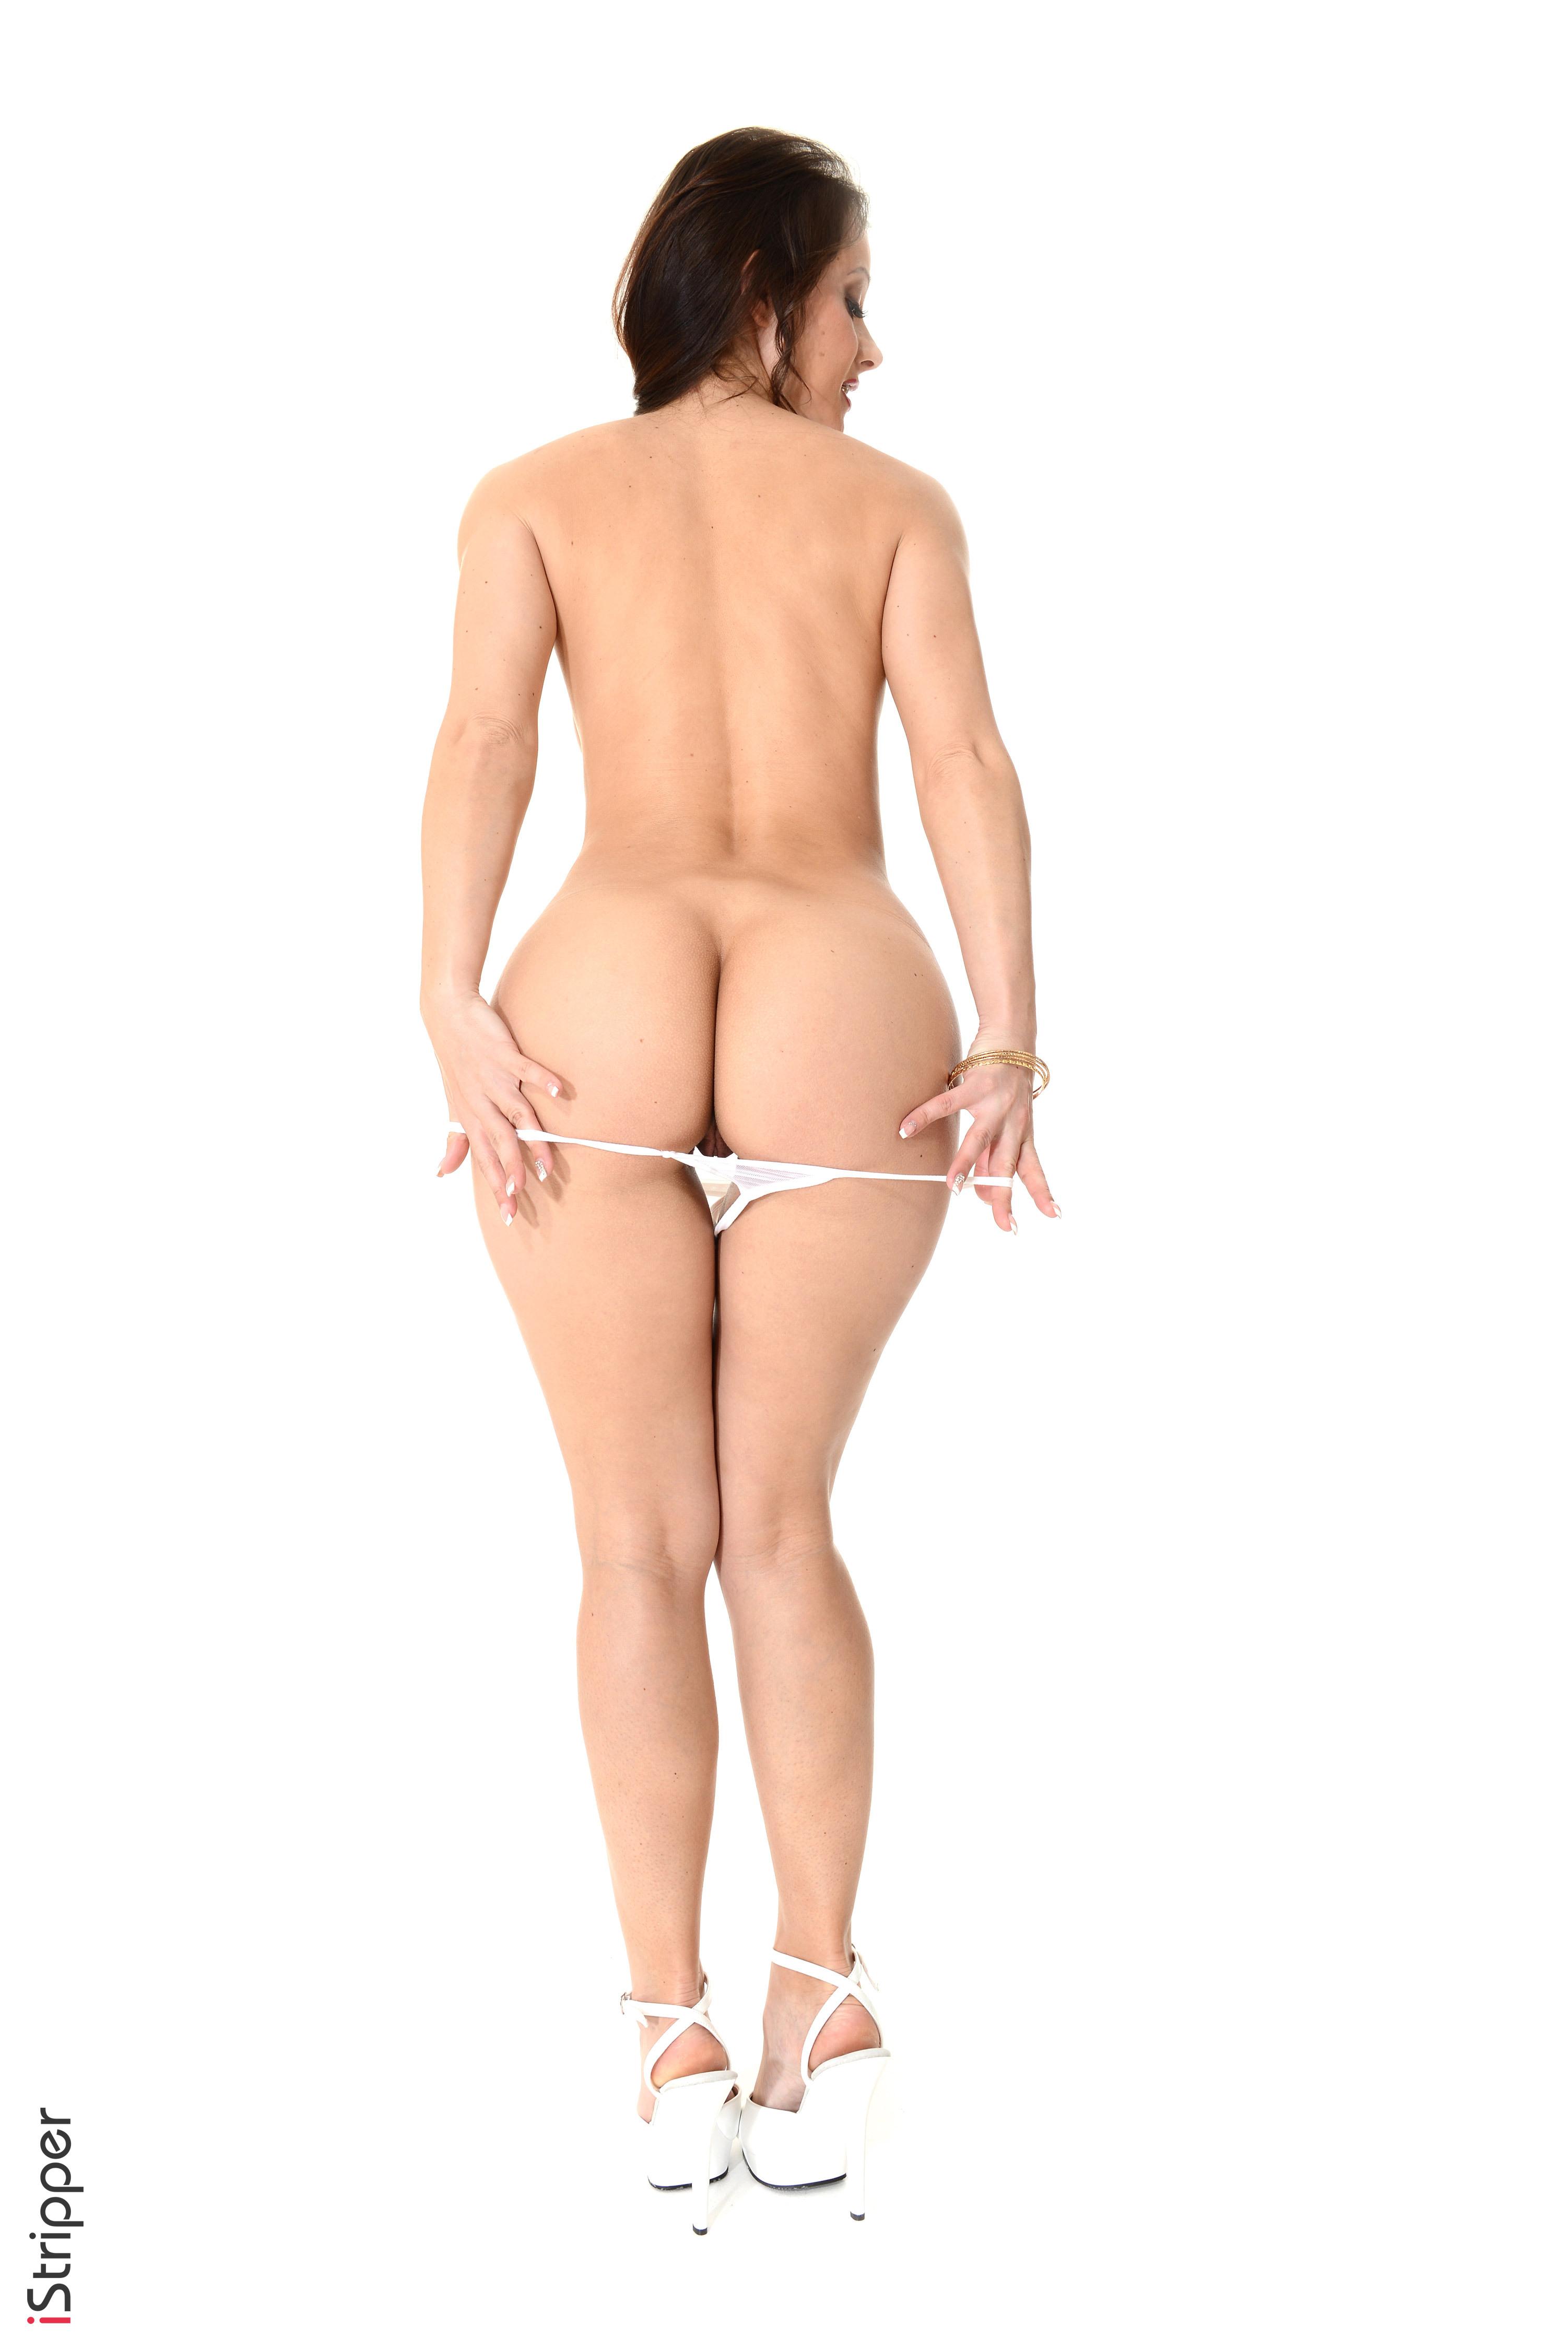 fit girls stripping